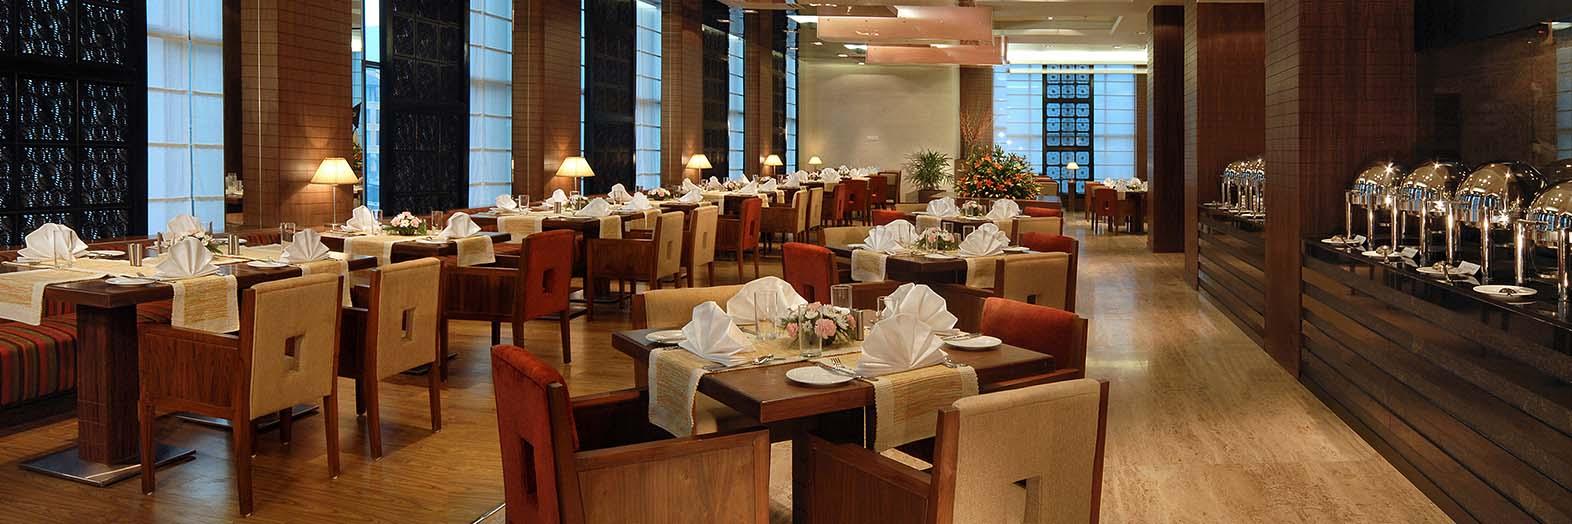 Restaurants in Lavasa